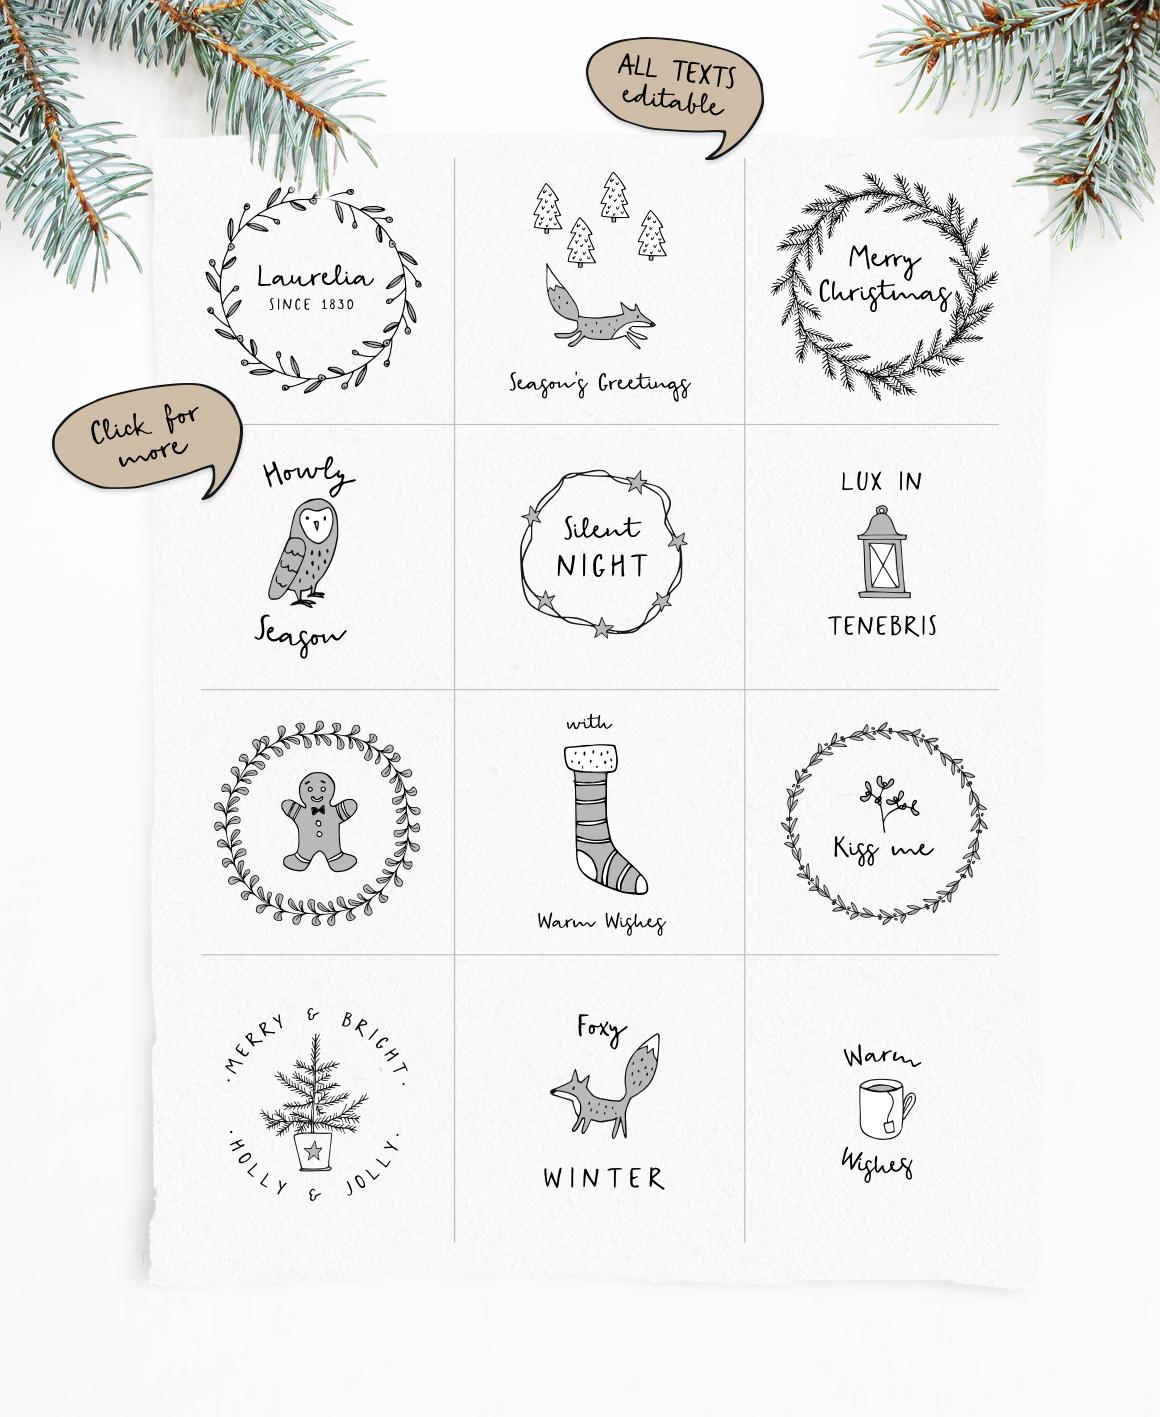 Snowy Christmas Script Font Tabitas World